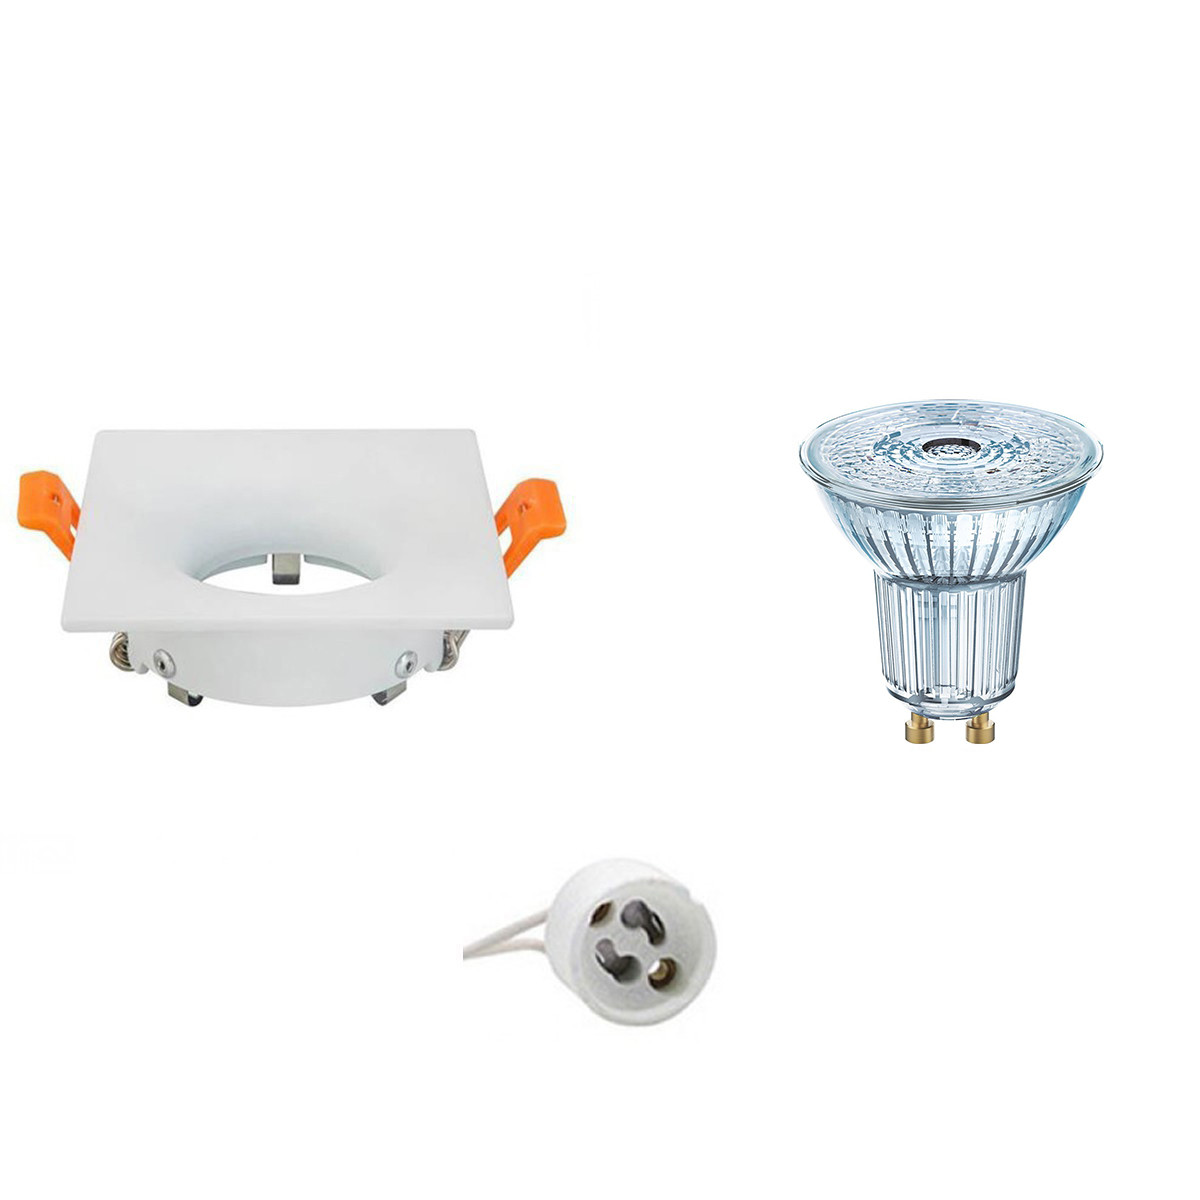 OSRAM - LED Spot Set - Parathom PAR16 927 36D - GU10 Fitting - Dimbaar - Inbouw Vierkant - Mat Wit -